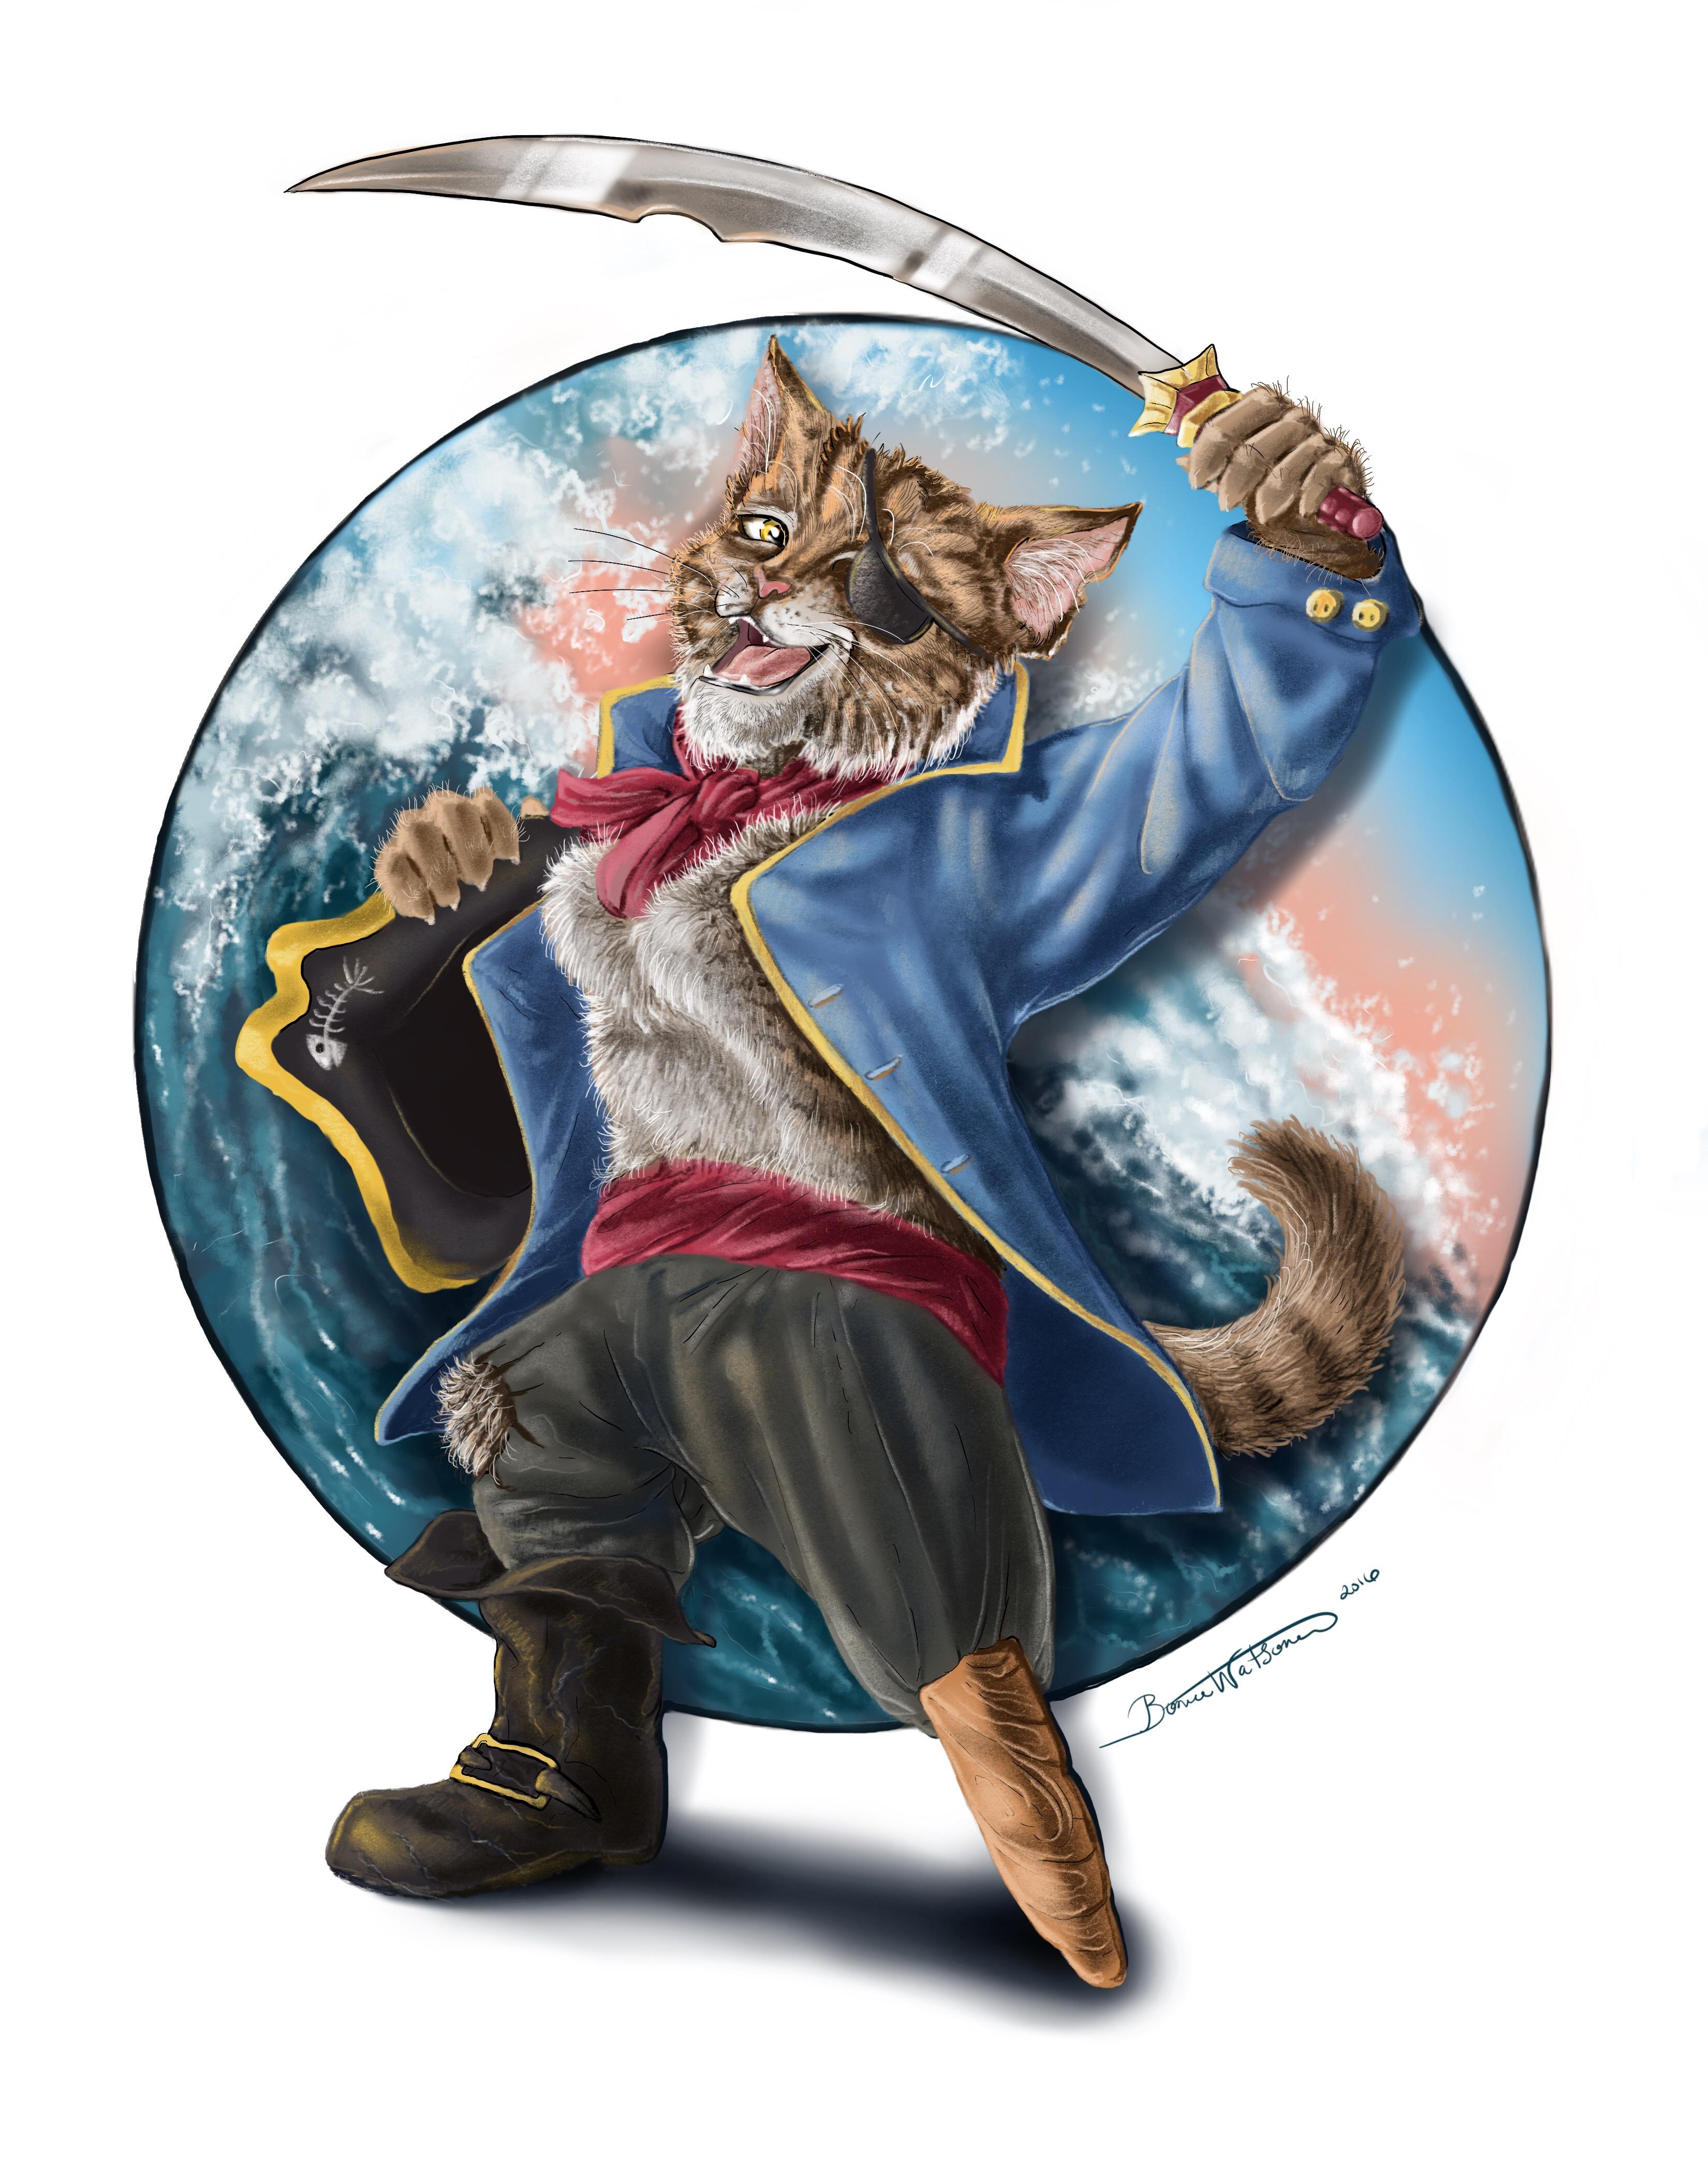 Captain Stumpy